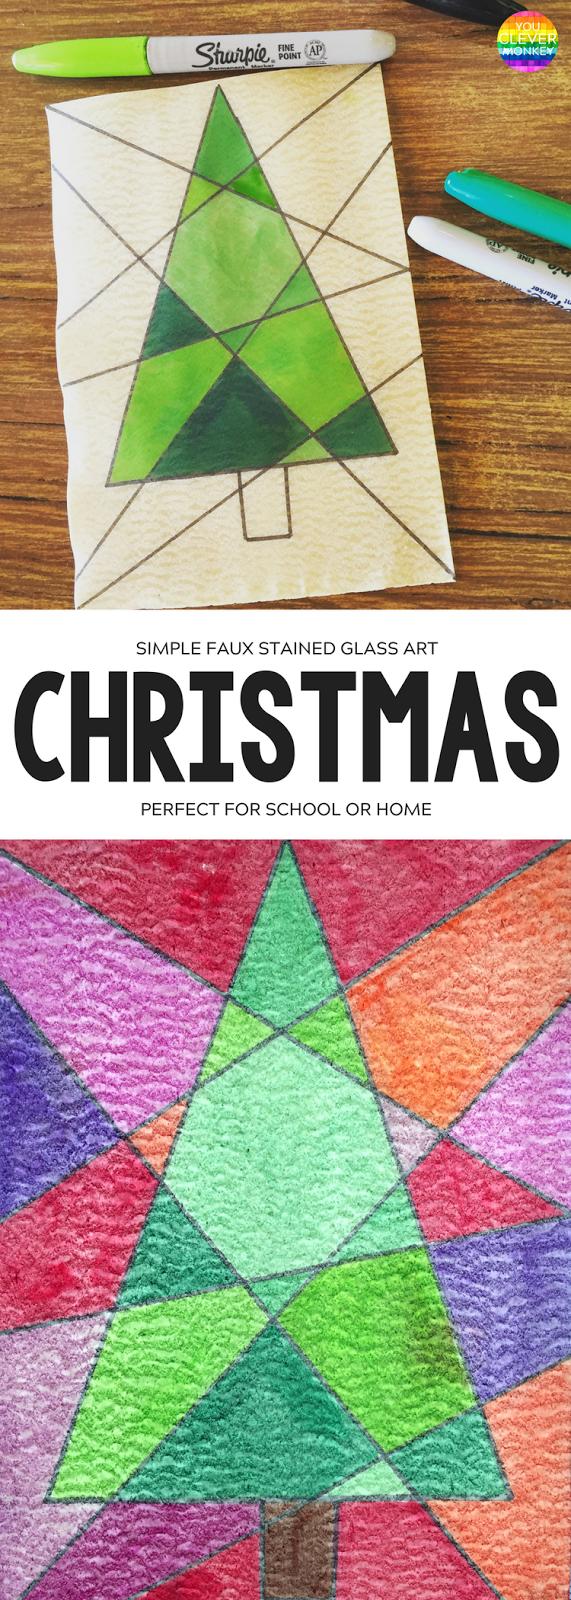 Modern Art Christmas Free Printable colouring sheets - colour to ...